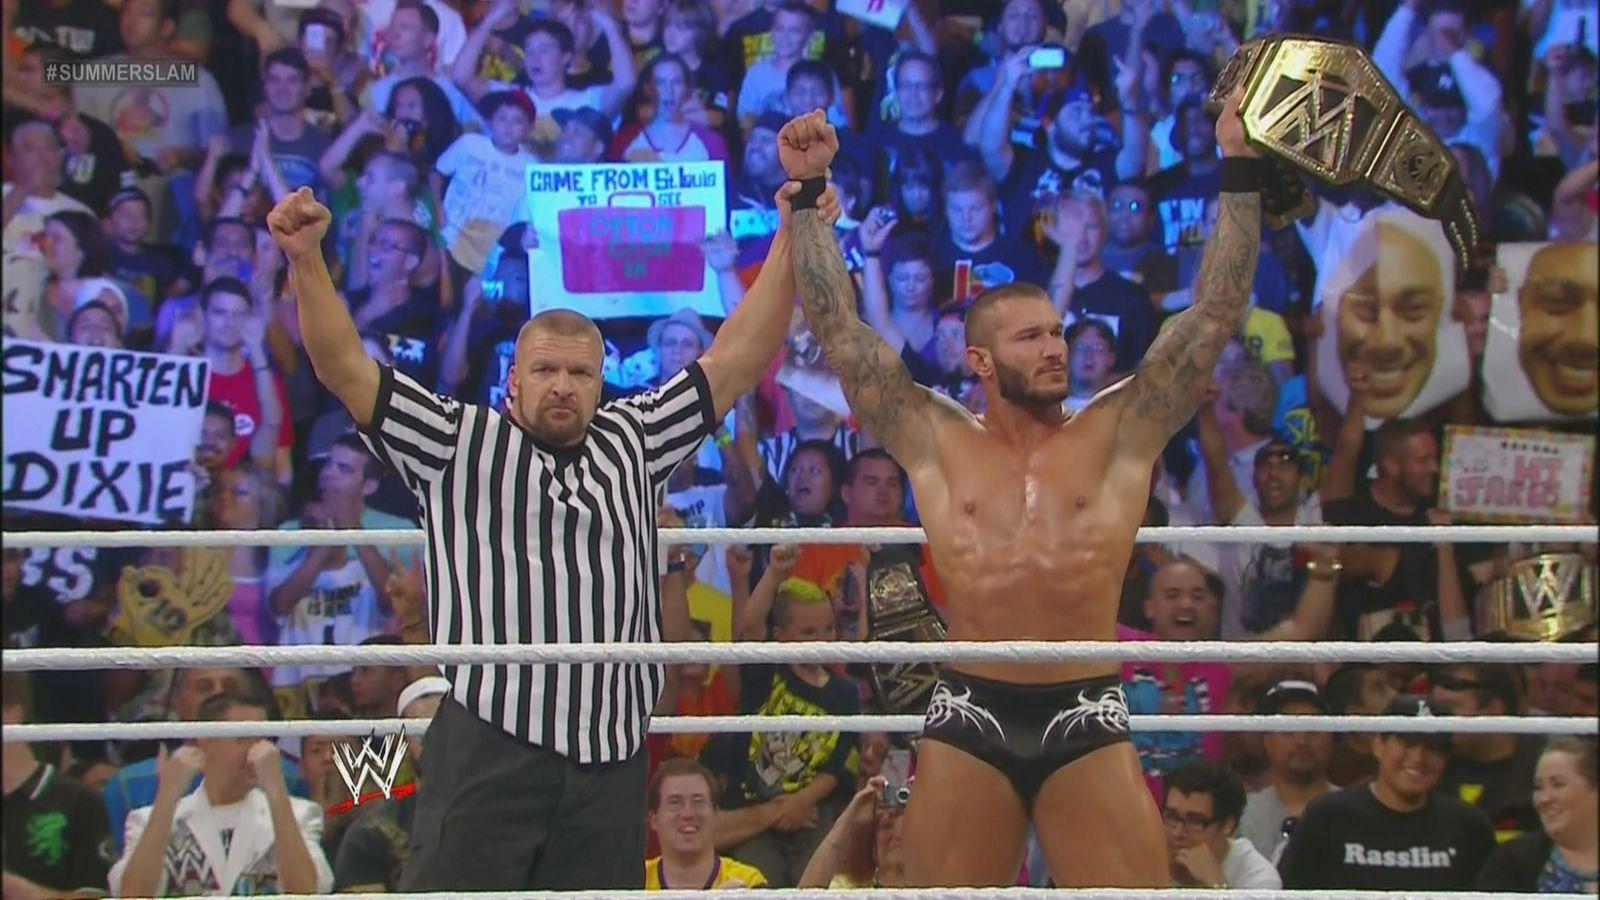 Summerslam results: Randy Orton cashes in Money in the Bank on Daniel  Bryan, wins WWE Title - SBNation.com